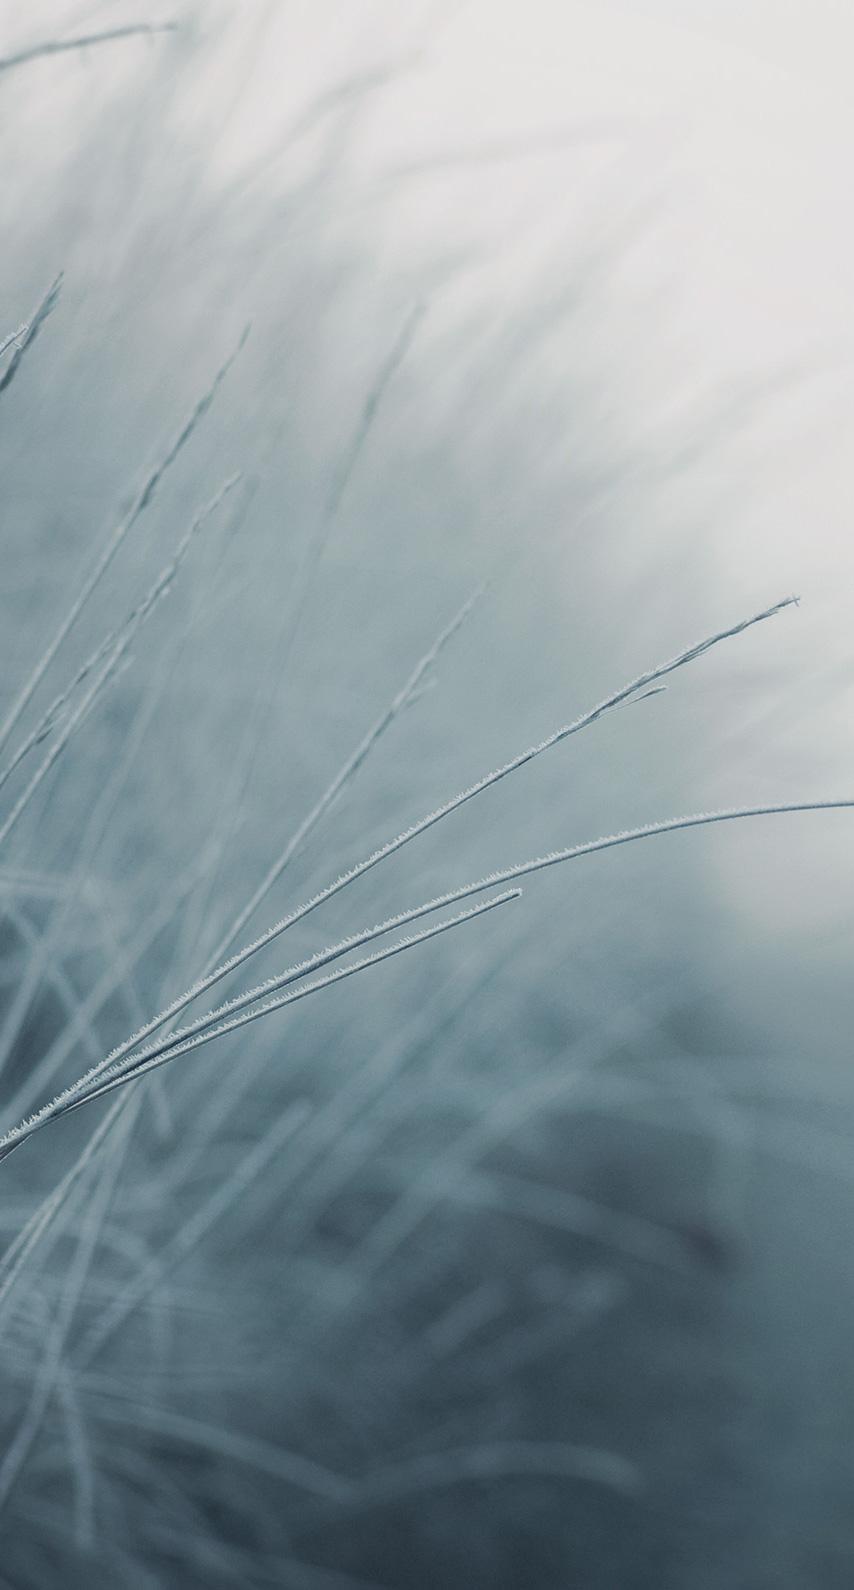 desktop, blur